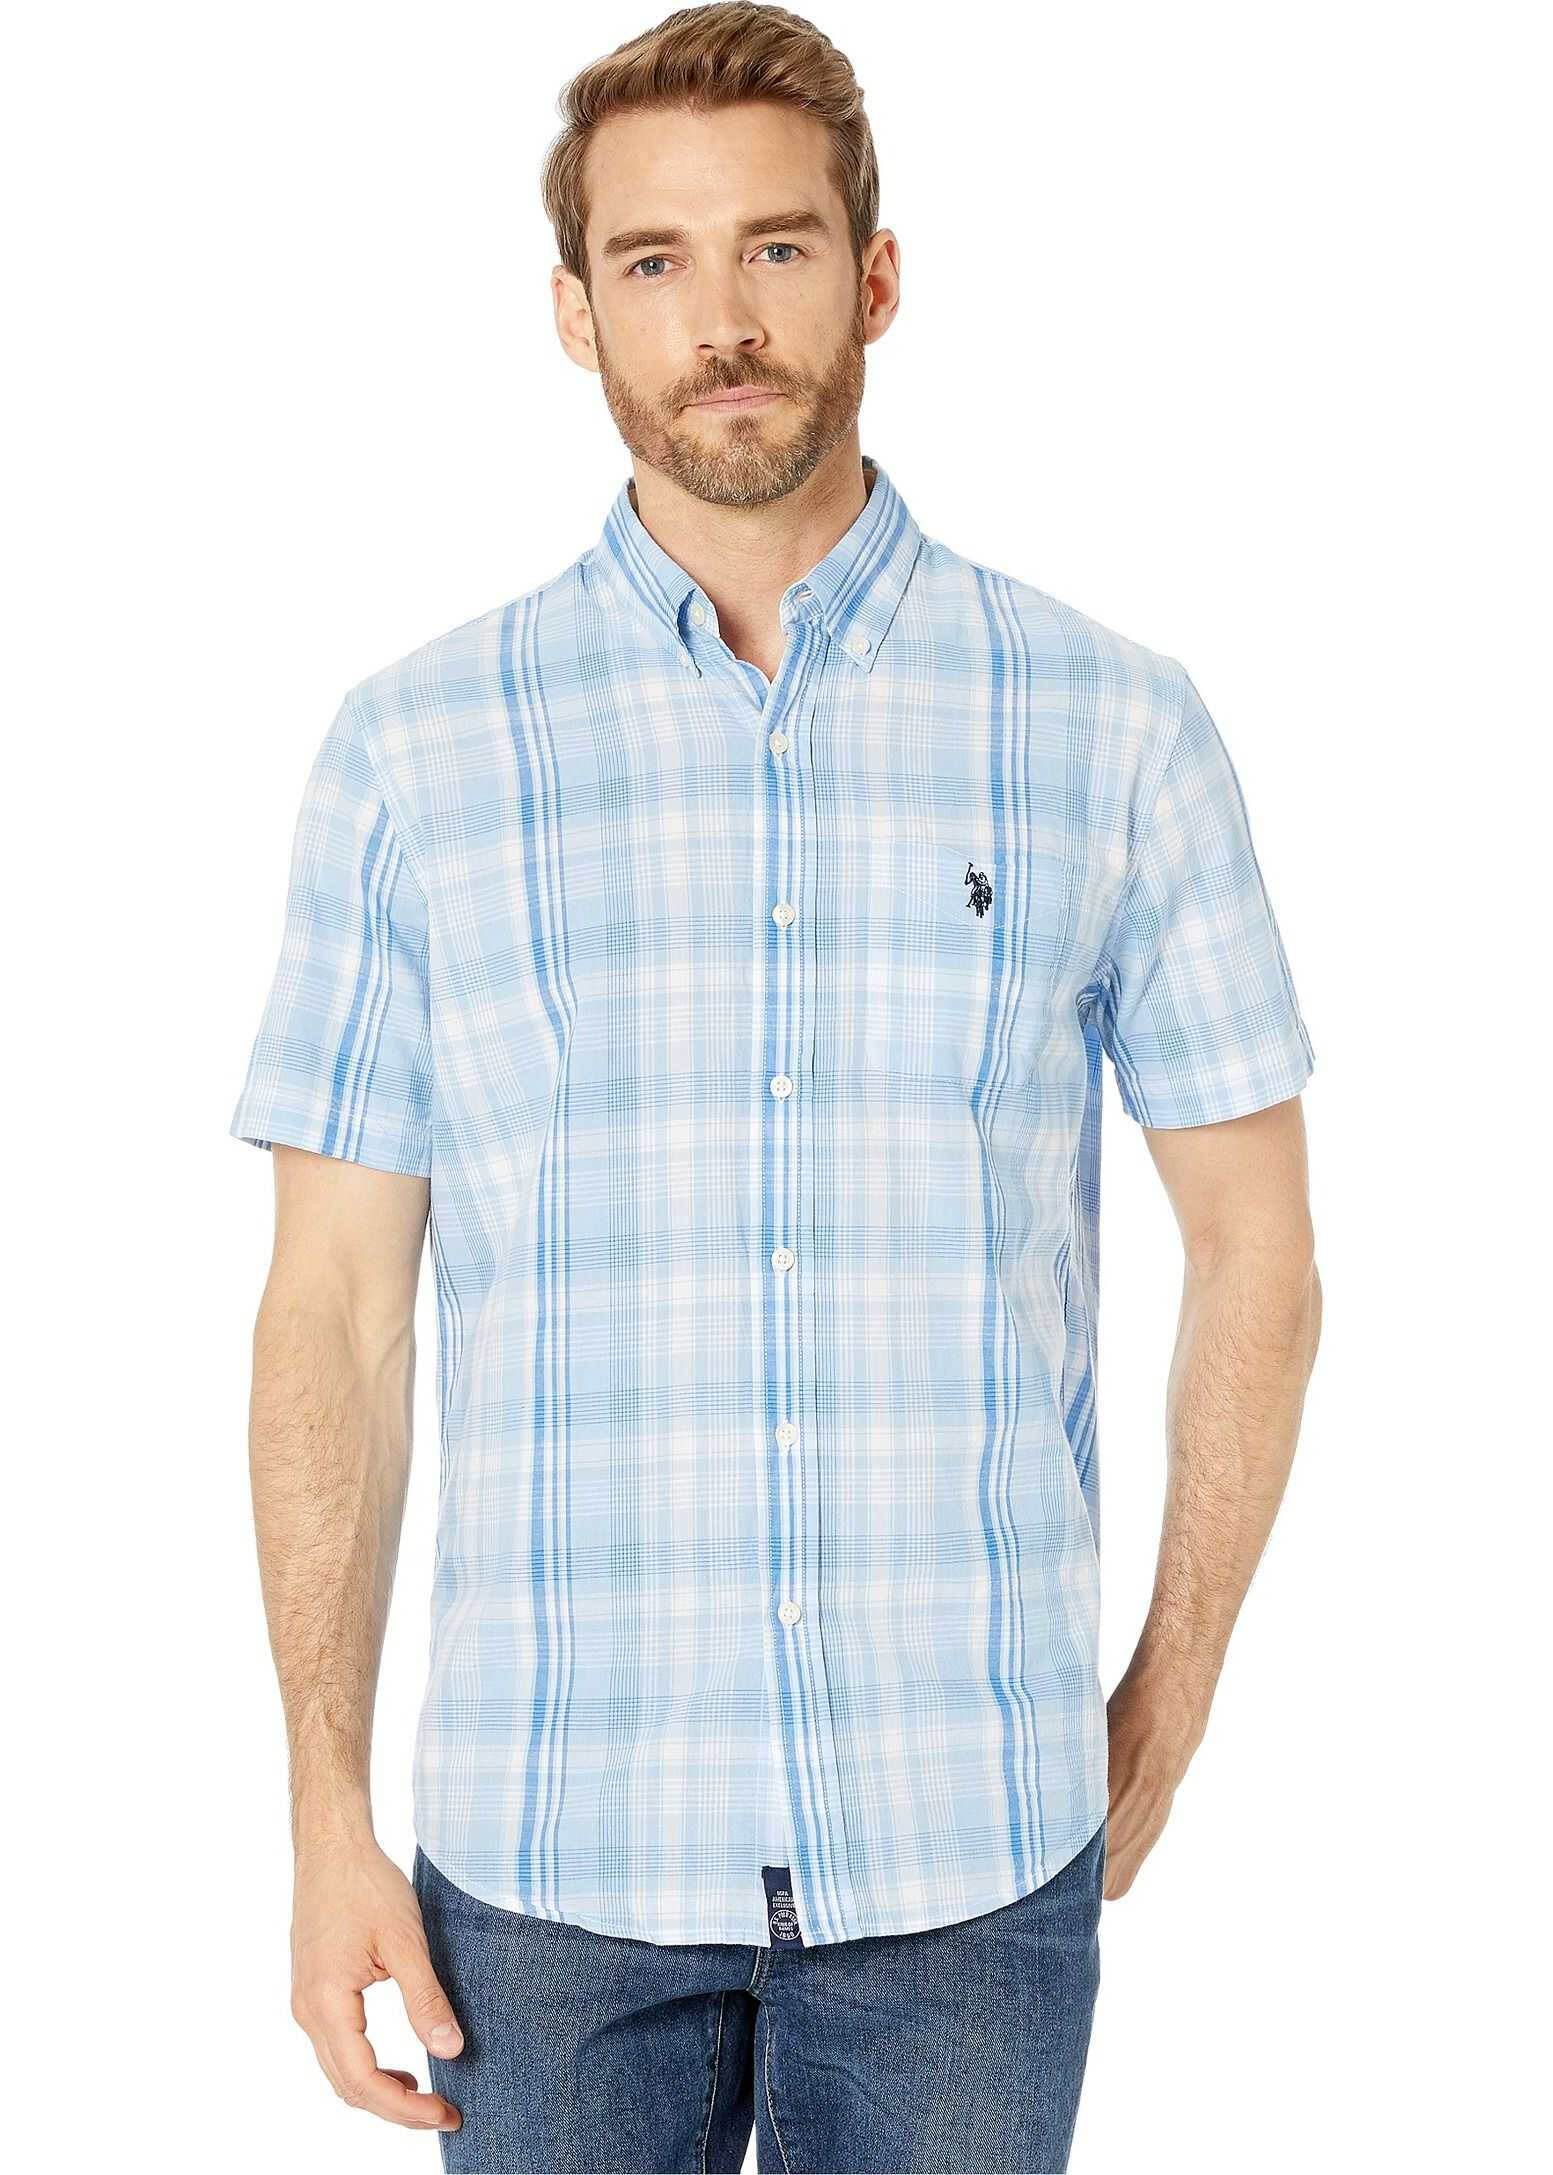 U.S. POLO ASSN. Short Sleeve Medium Plaid Woven Tahoe Blue